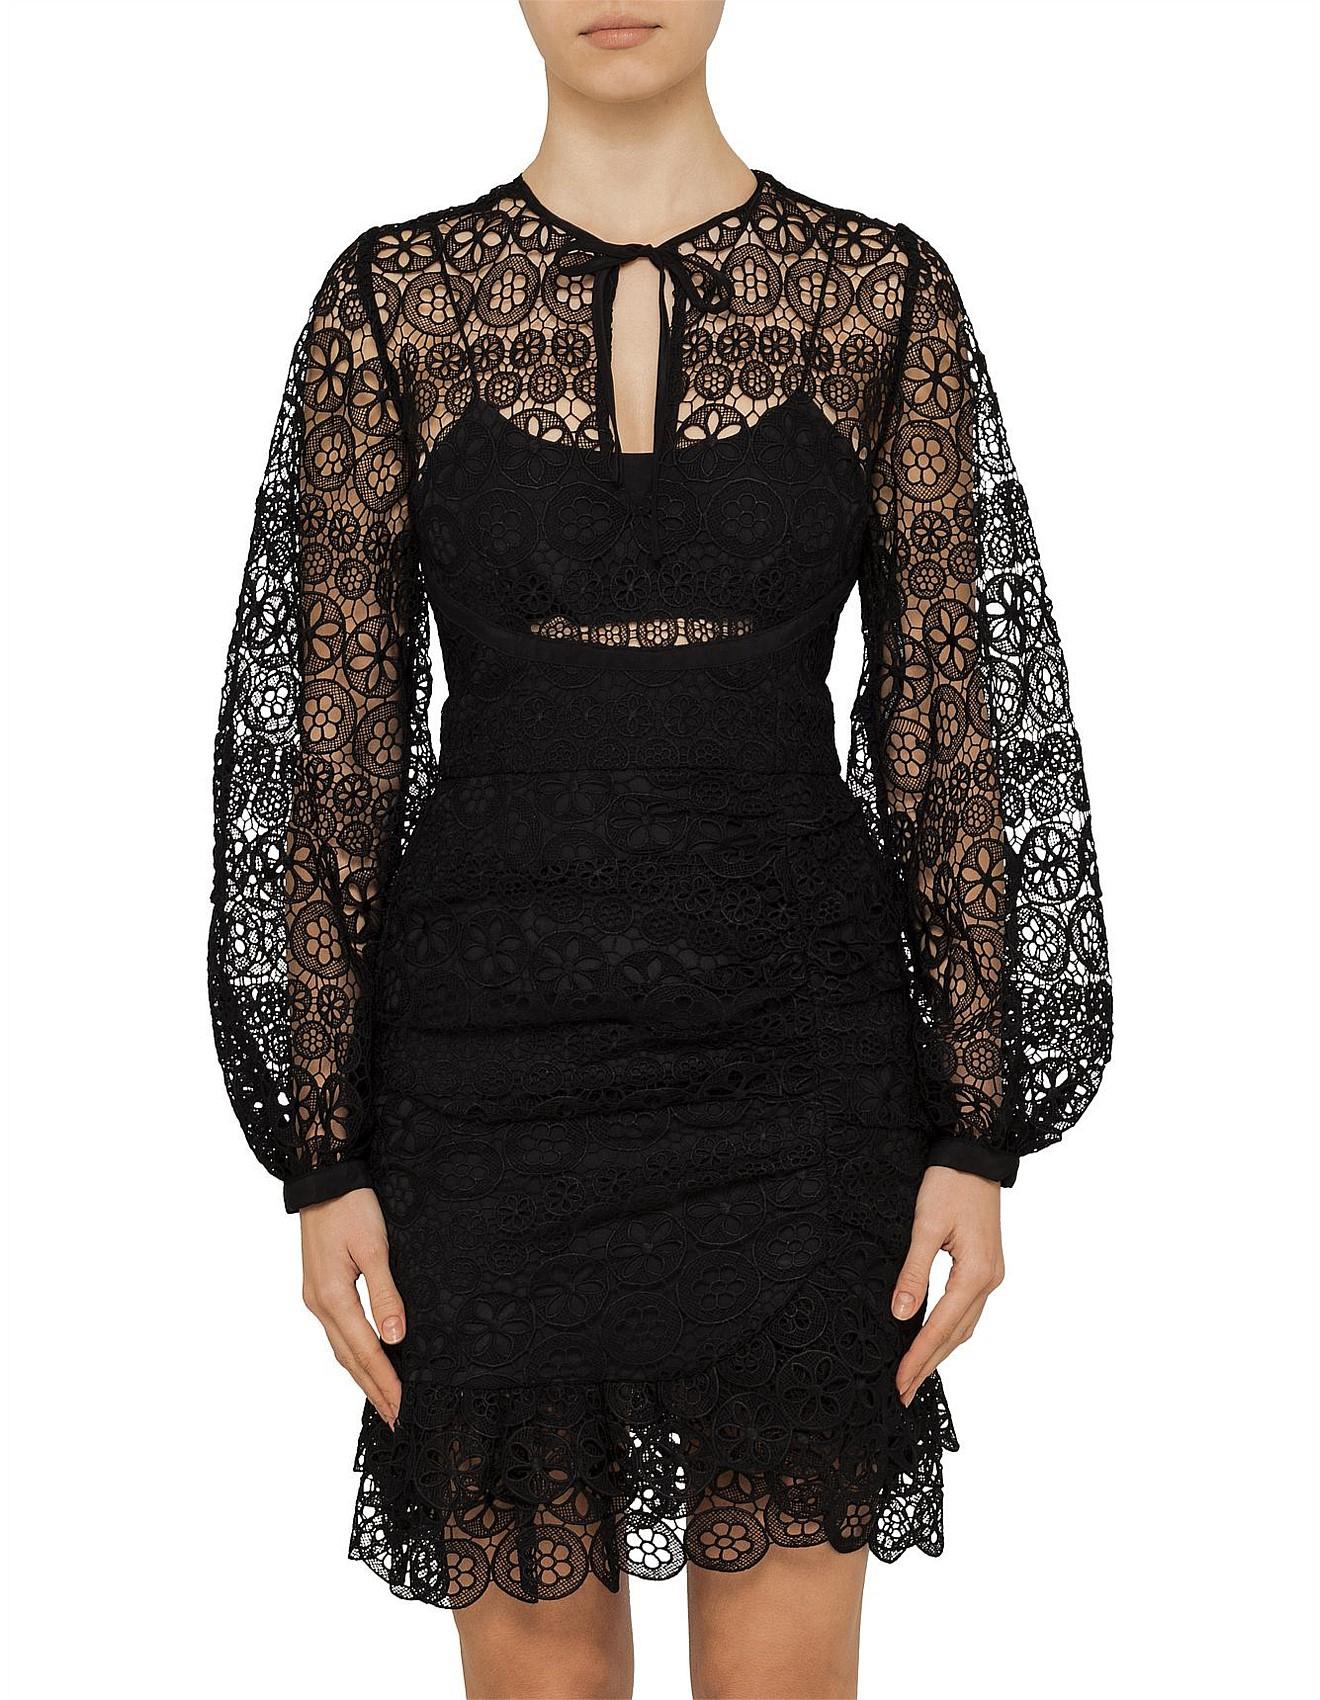 5b3a81ab447 Women Spring Racing - Black Circle Floral Long Sleeve Lace Mini Dress